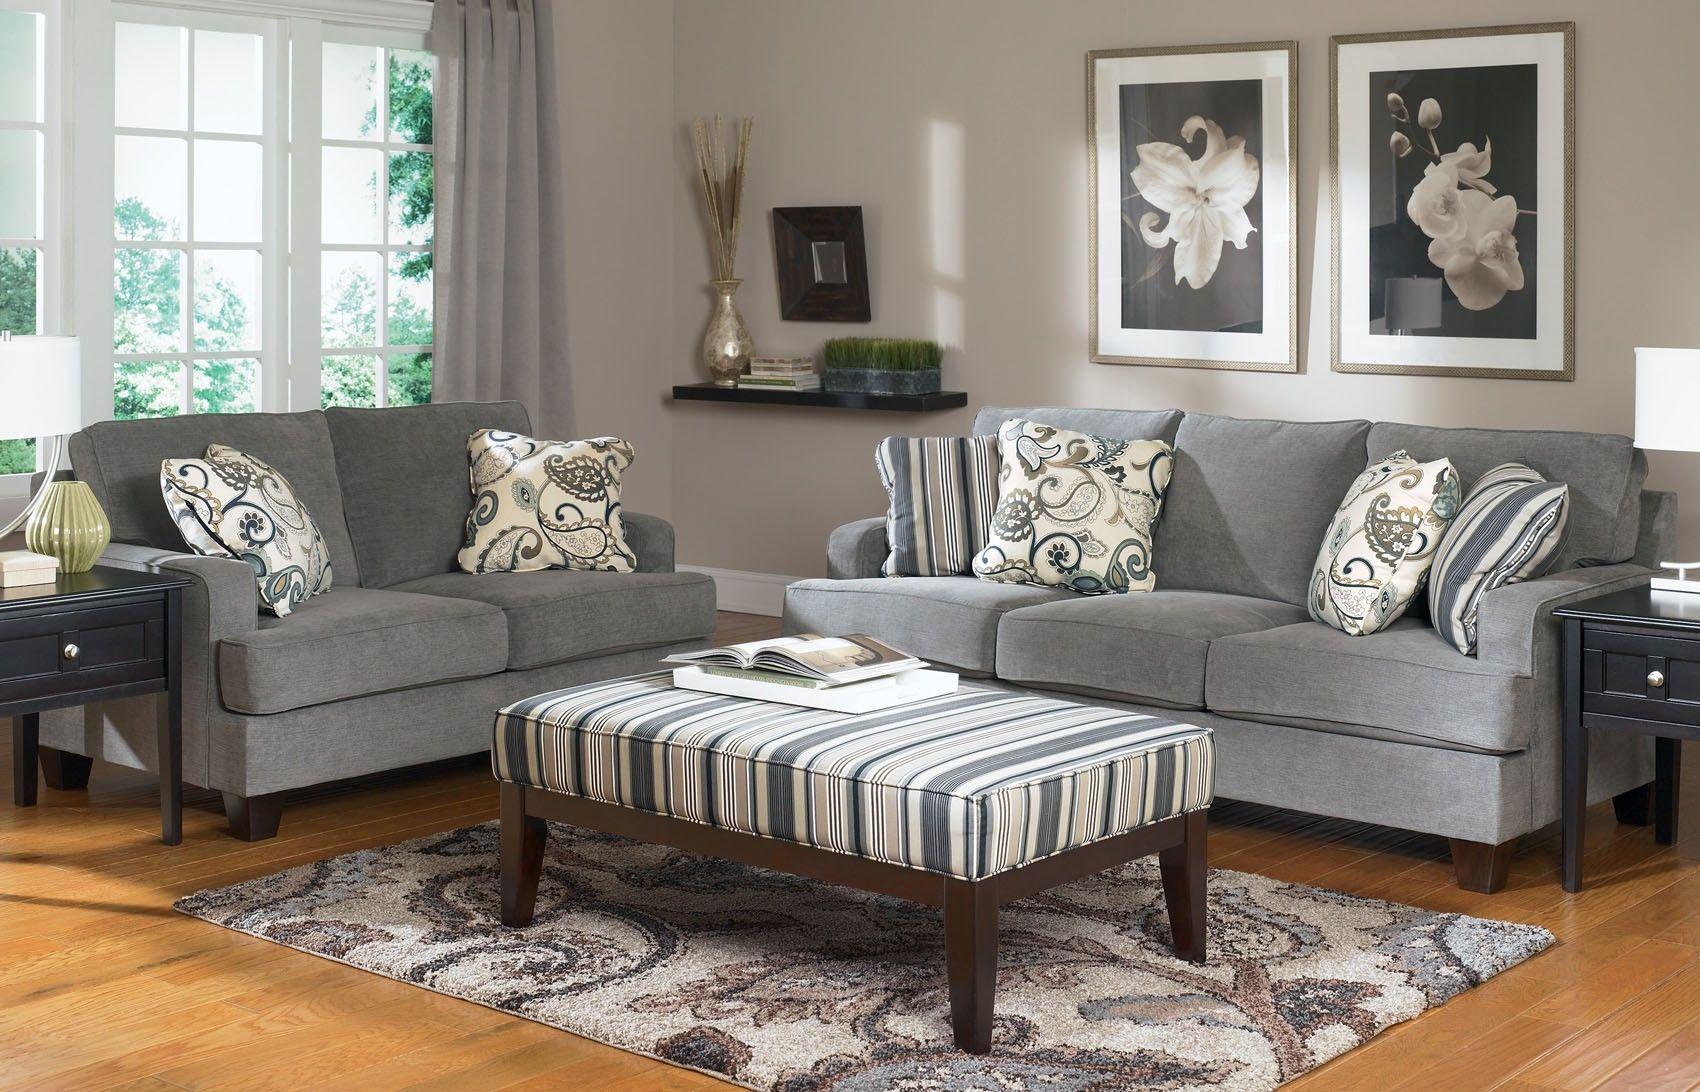 Yvette Sofa And Loveseat Set 7790035 Ashley Furniture 999 Grey